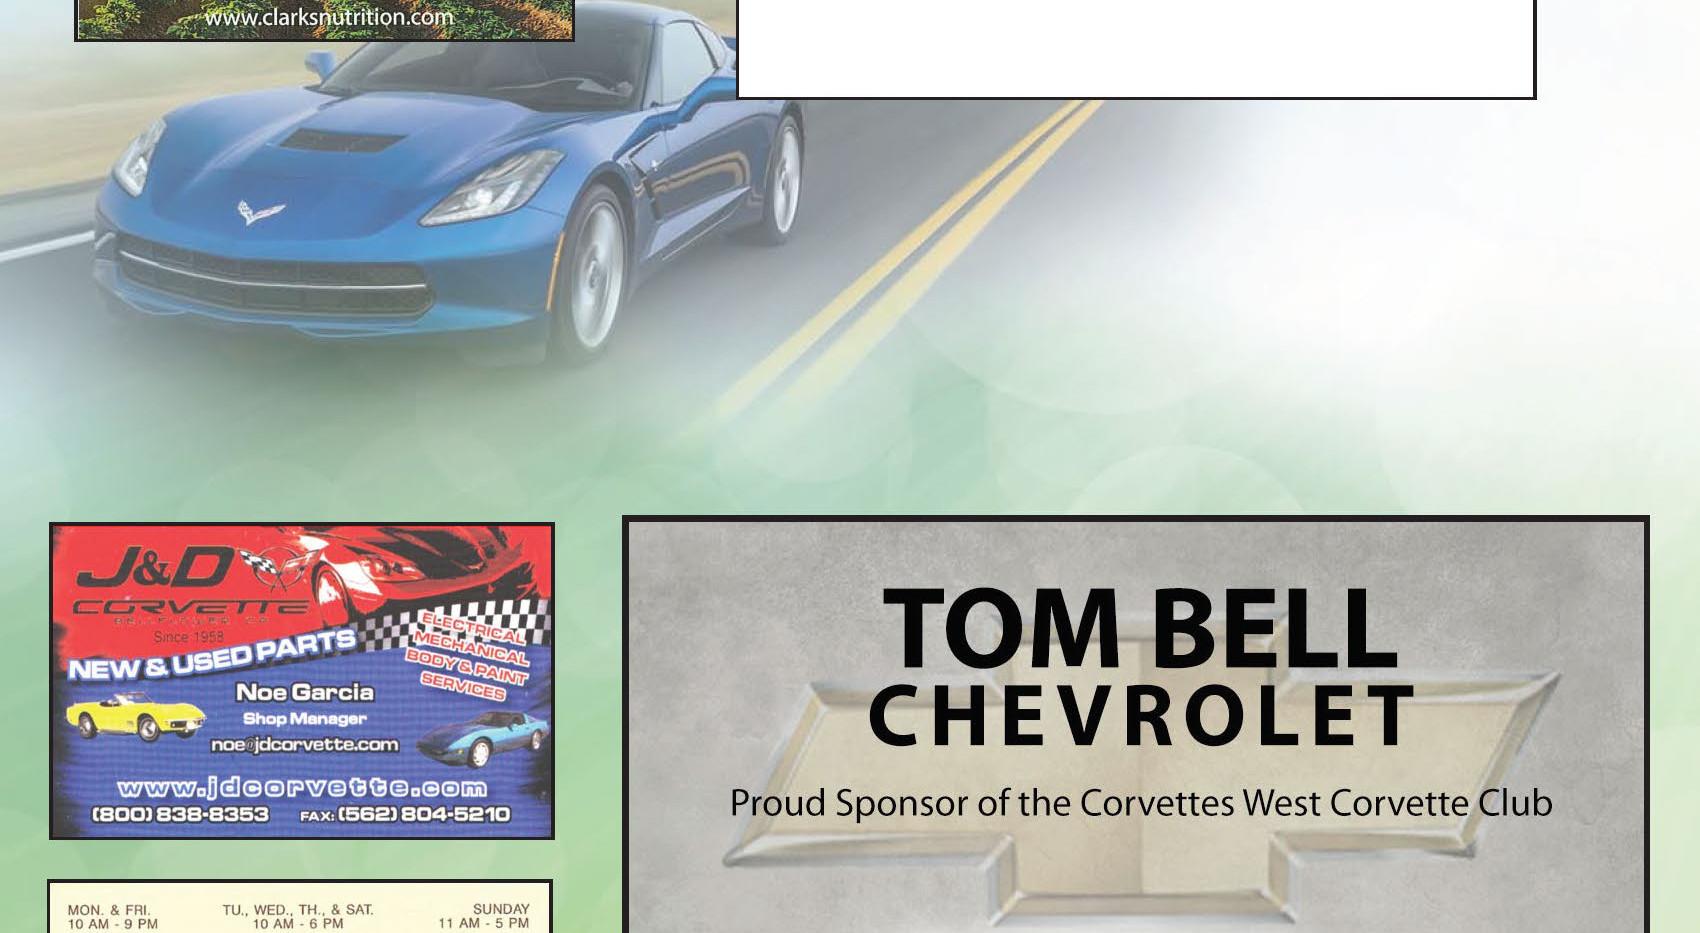 corvettes west news 1220_Page_10.jpg